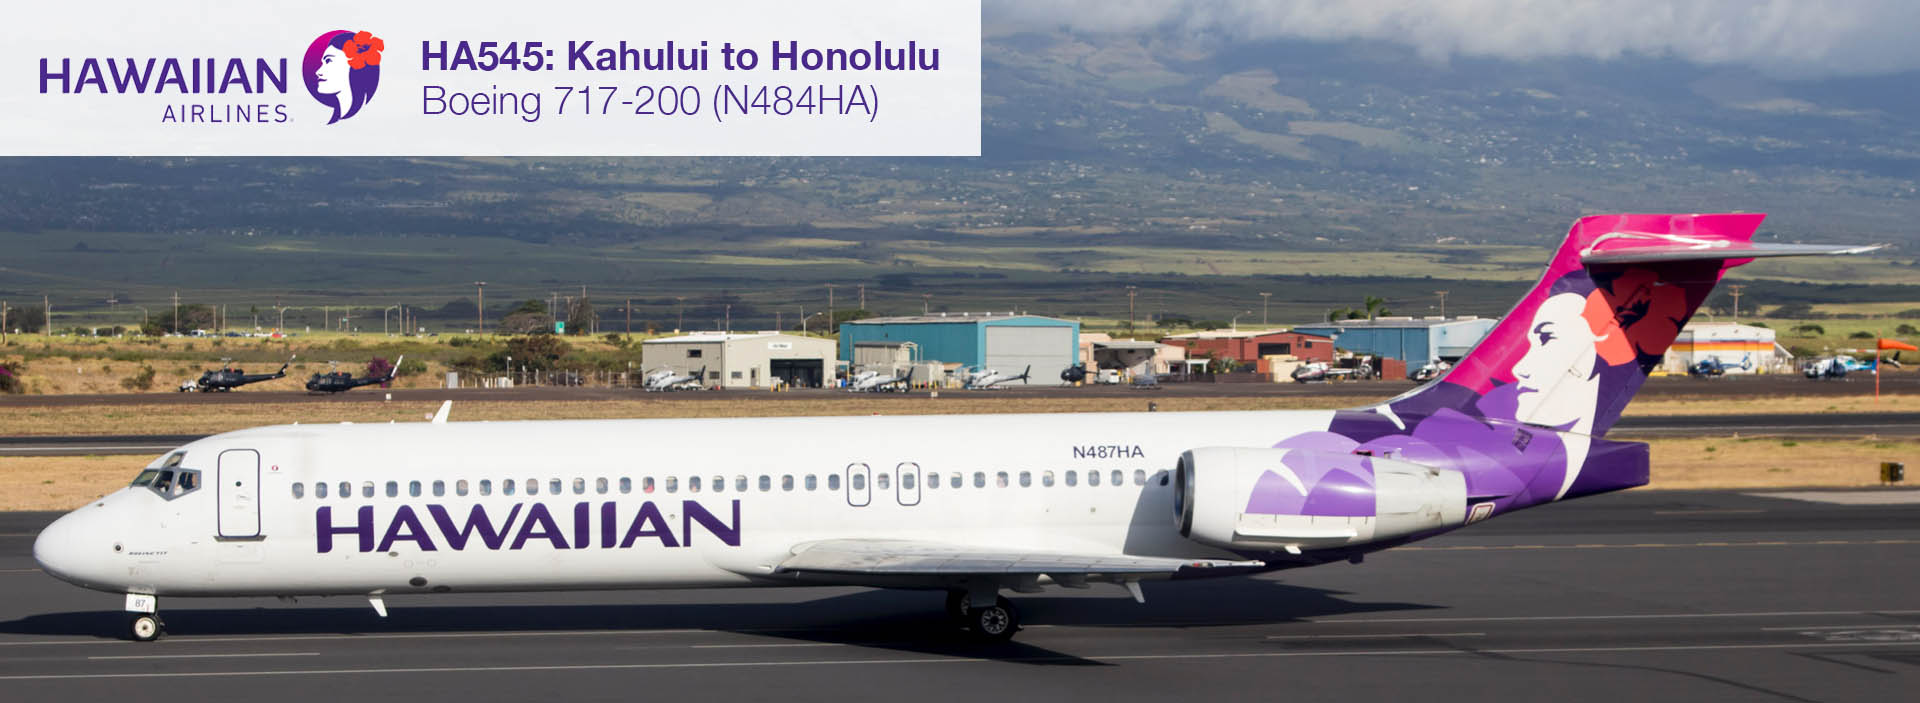 Hawaiian Airlines 717 Economy Class Kahului to Honolulu Flight Review